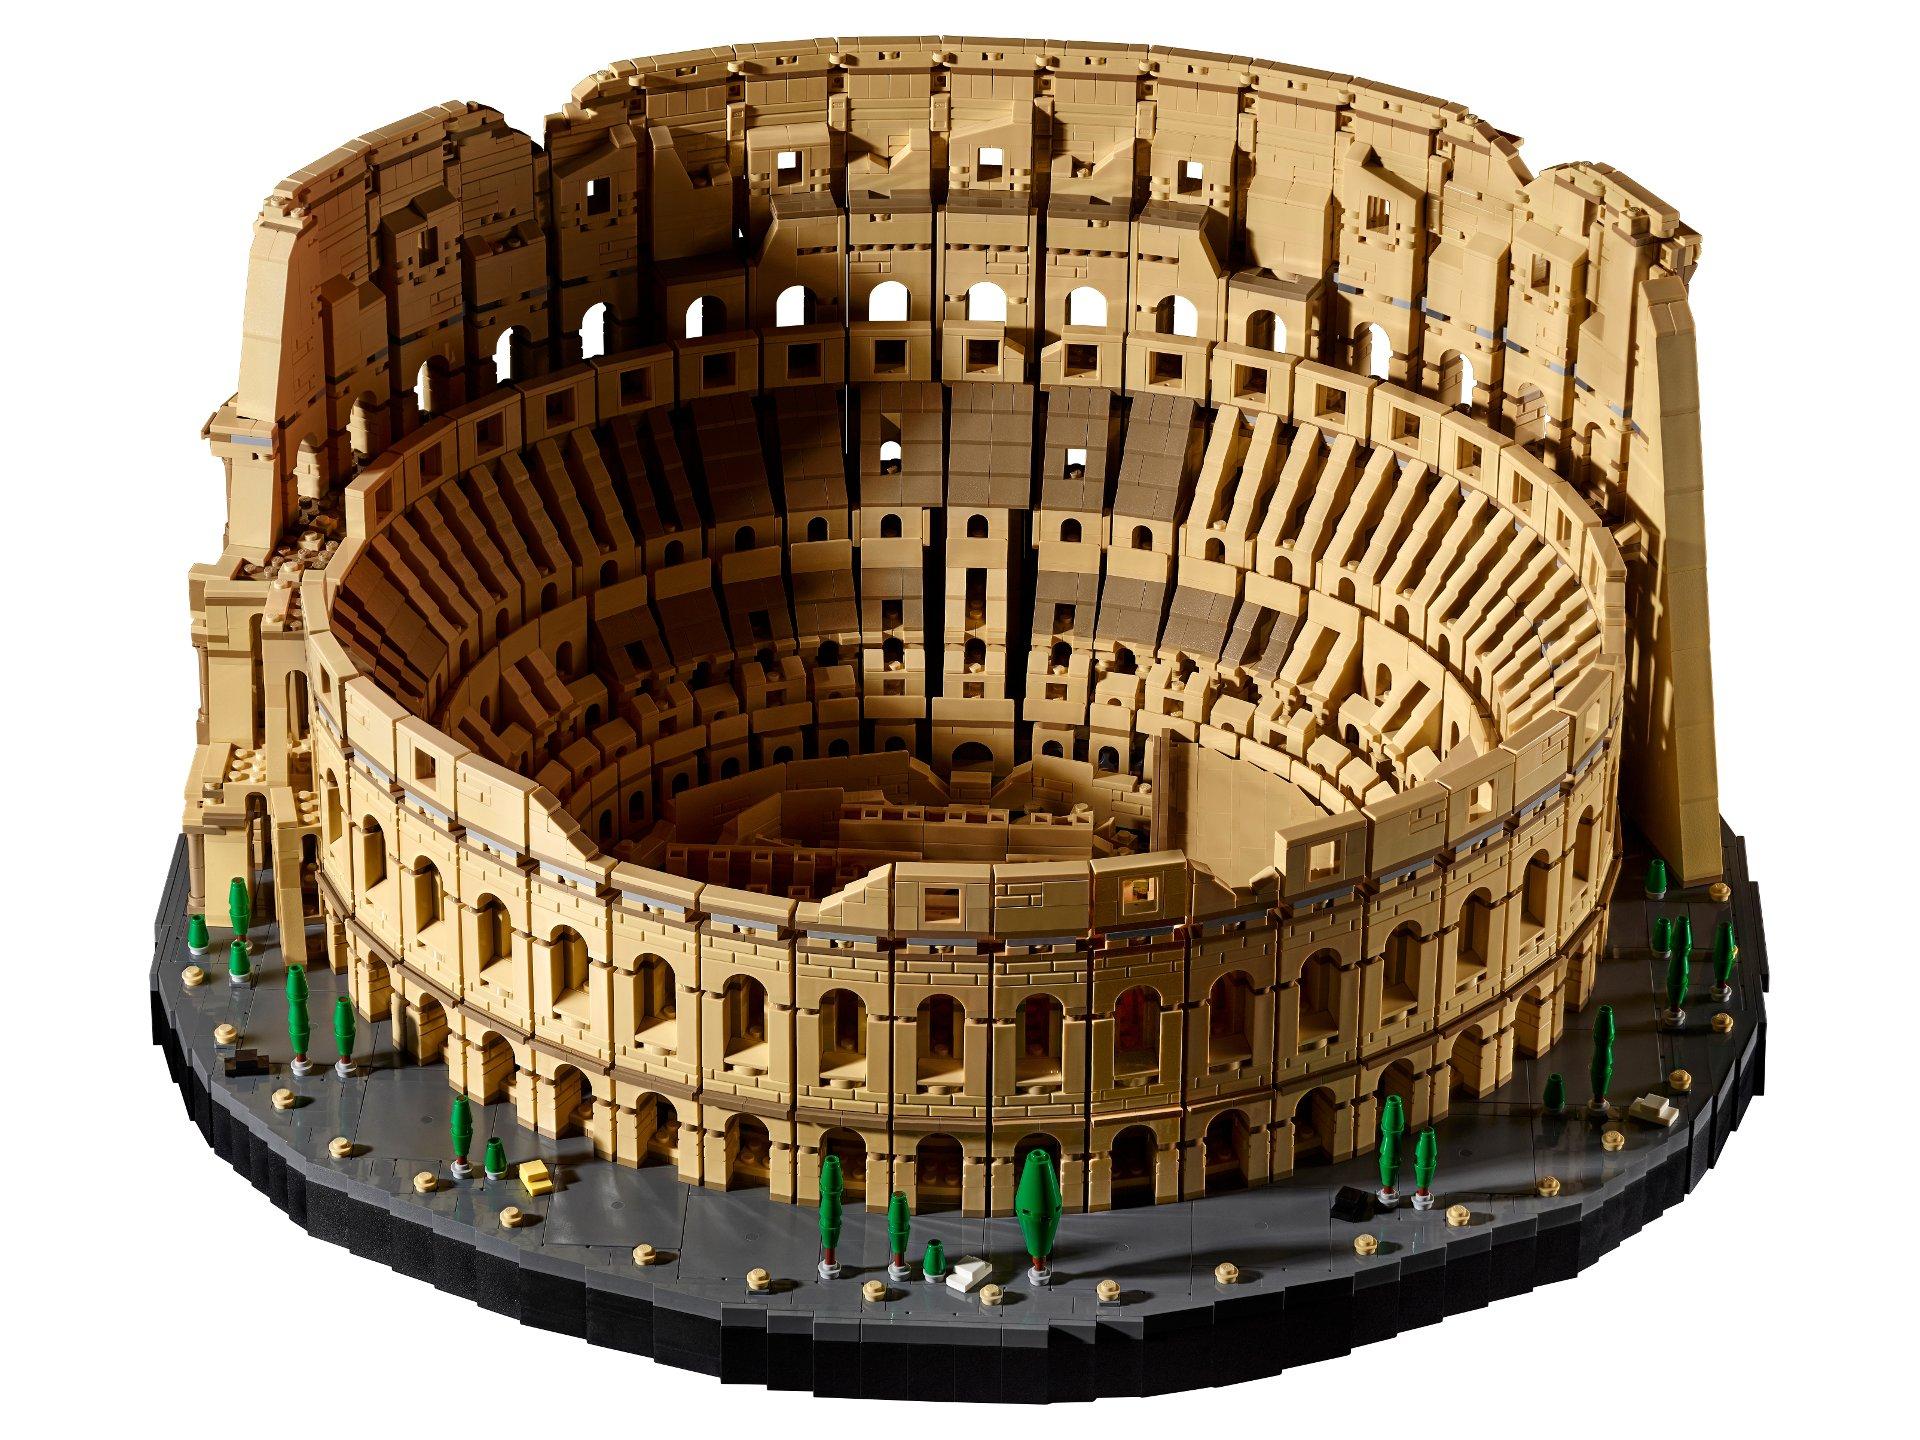 lego creator expert 10276 kolosseum ab 27.11.2020 verfügbar